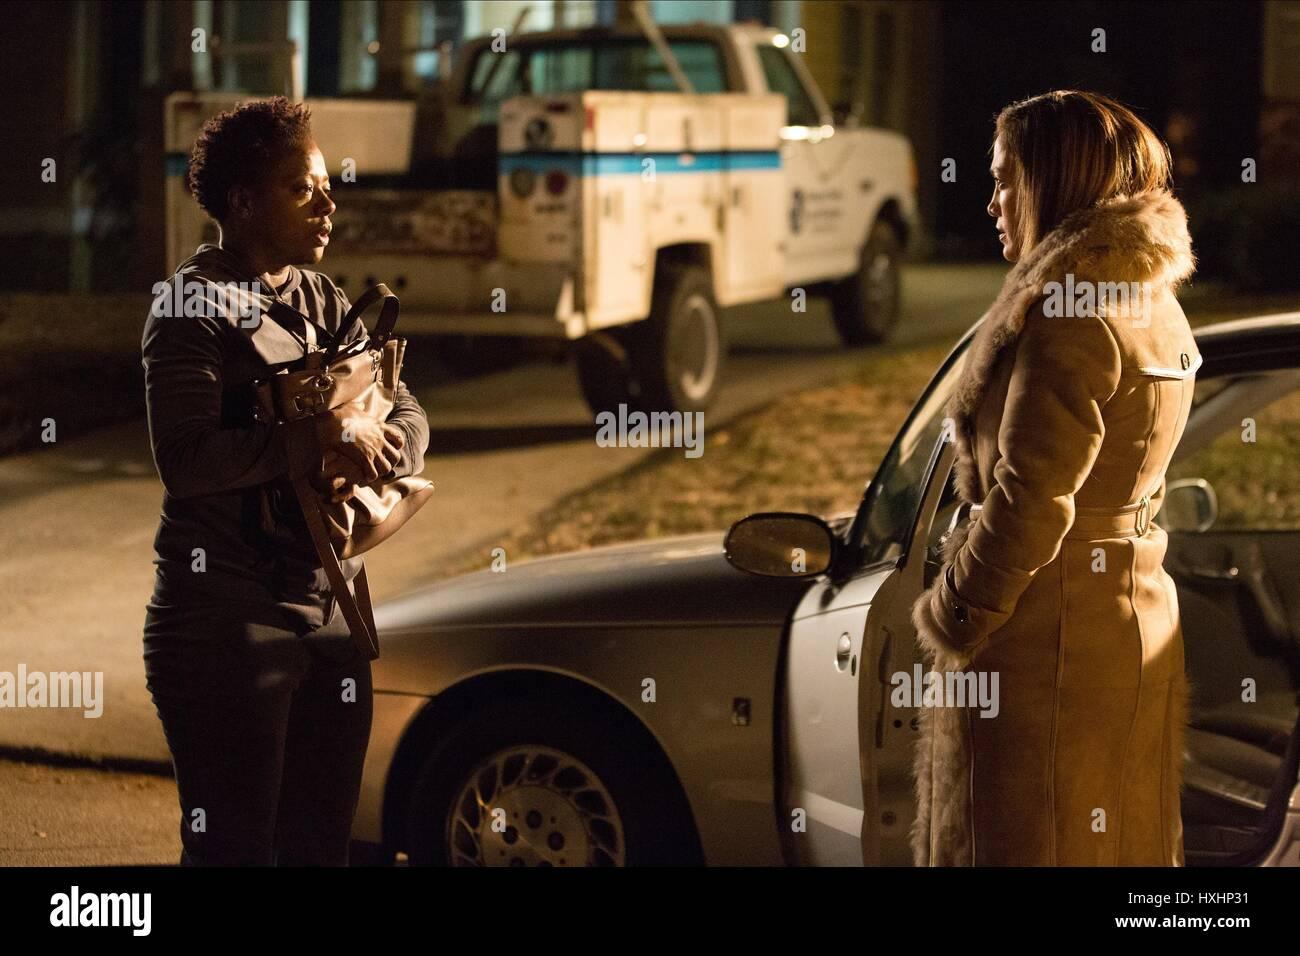 VIOLA DAVIS & JENNIFER LOPEZ LILA & EVE (2015) - Stock Image